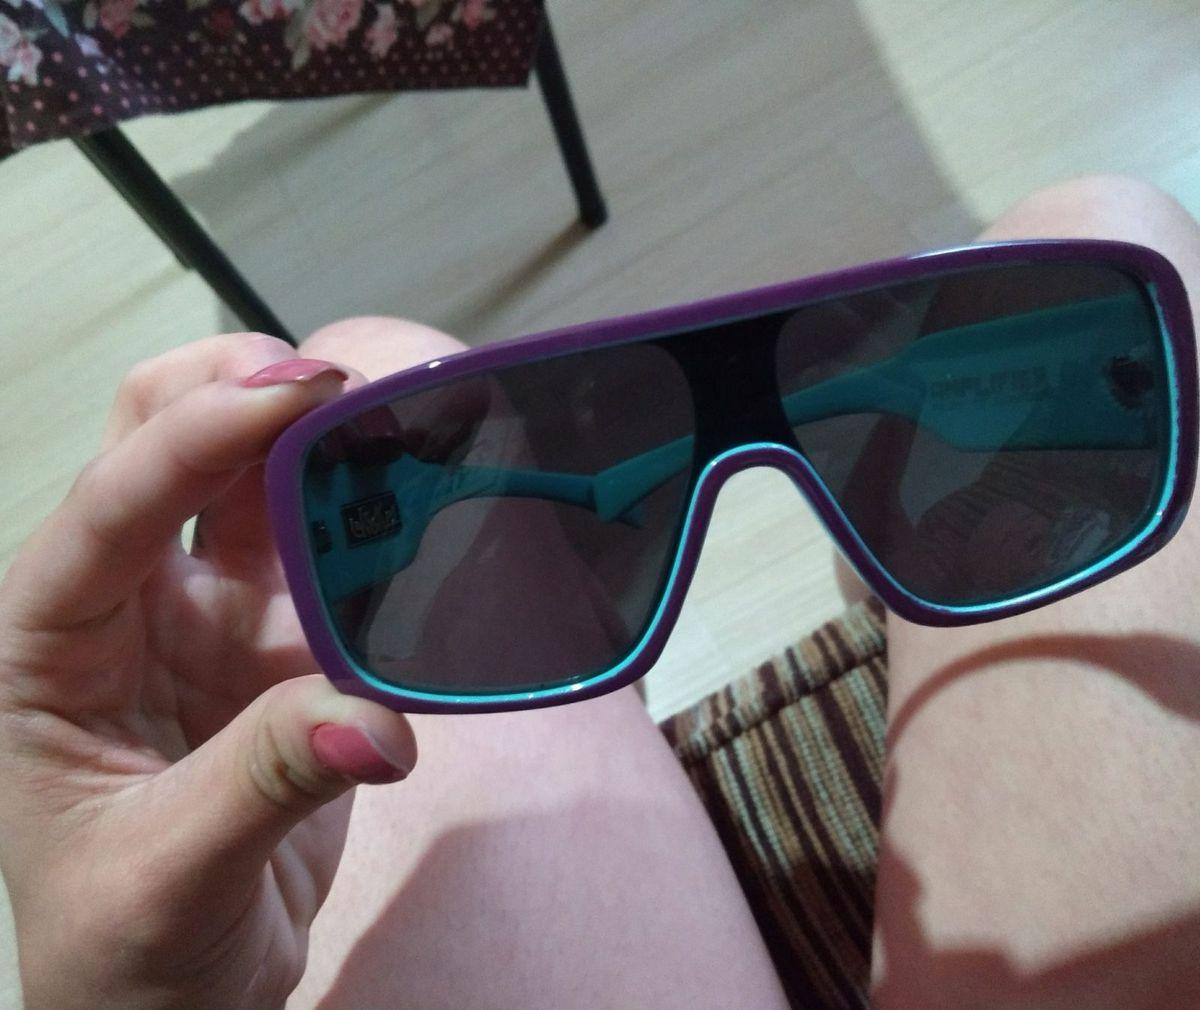 evoke amplifier - óculos evoke.  Czm6ly9wag90b3muzw5qb2vplmnvbs5ici9wcm9kdwn0cy84nda3mtu1l2nmnjlkowfimmjkzwqzyjy2ogjkn2yxn2zhndi3yzfklmpwzw  ... 6f17b5a4b3